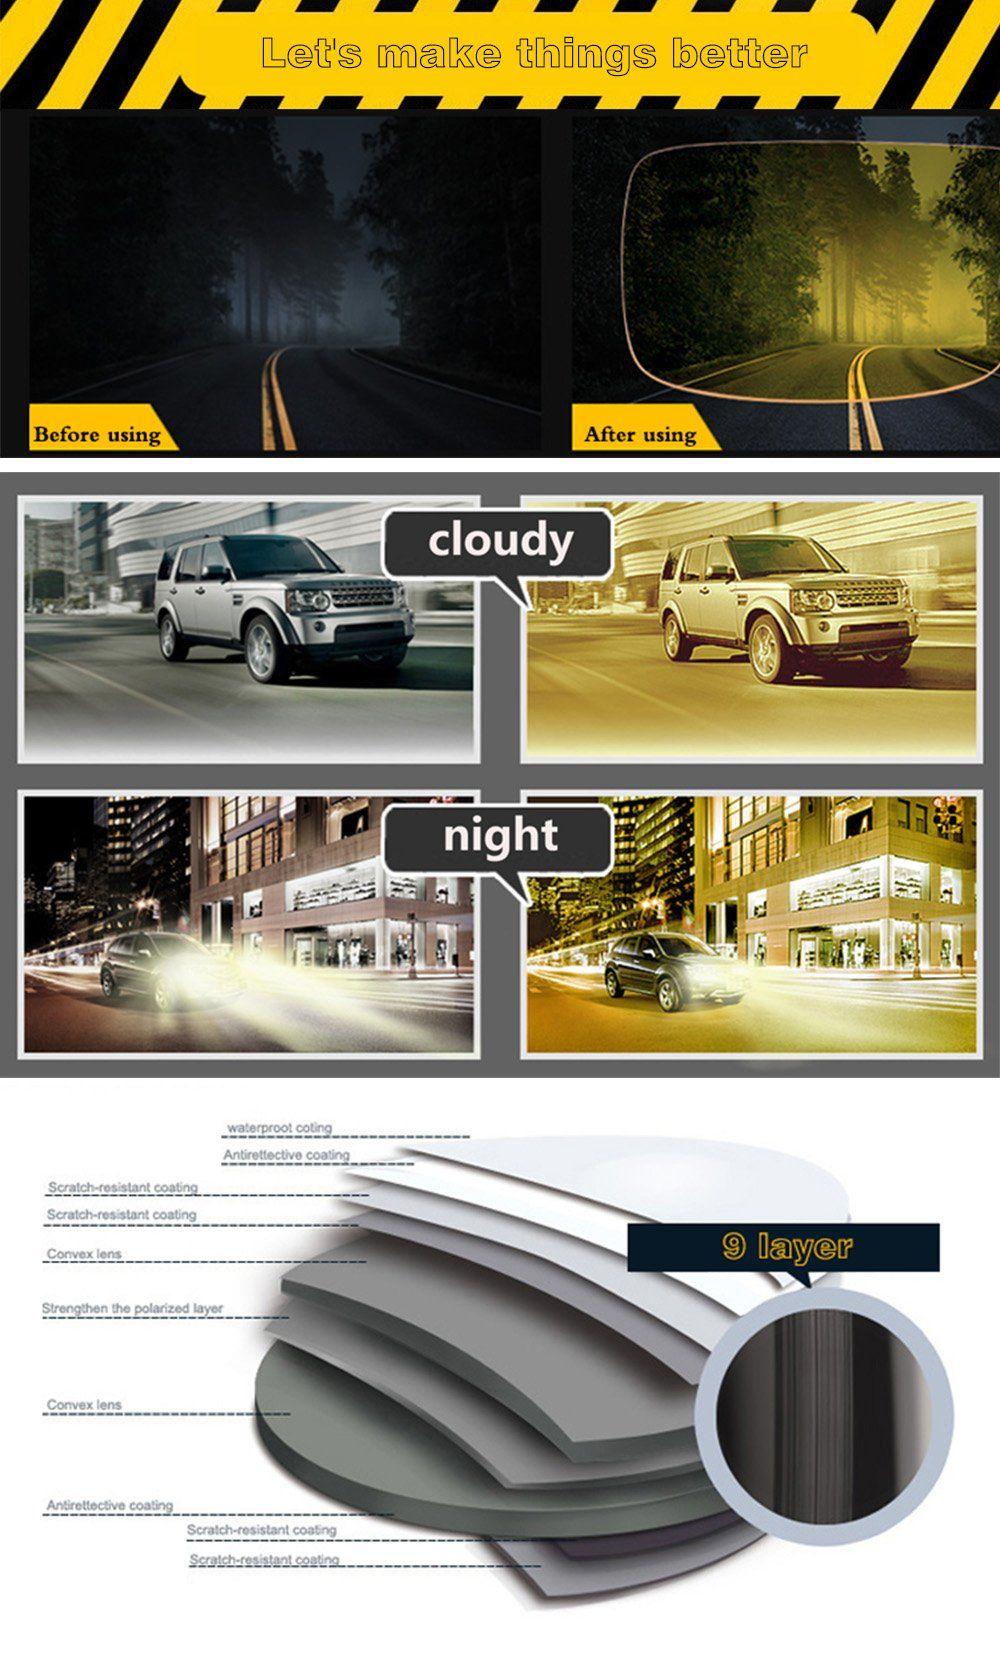 9c82ddc796 Men Golf Clothing - SOXICK Polarized Night Vision Glasses For Driving  Fashion Sunglasses Anti Glare Glasses